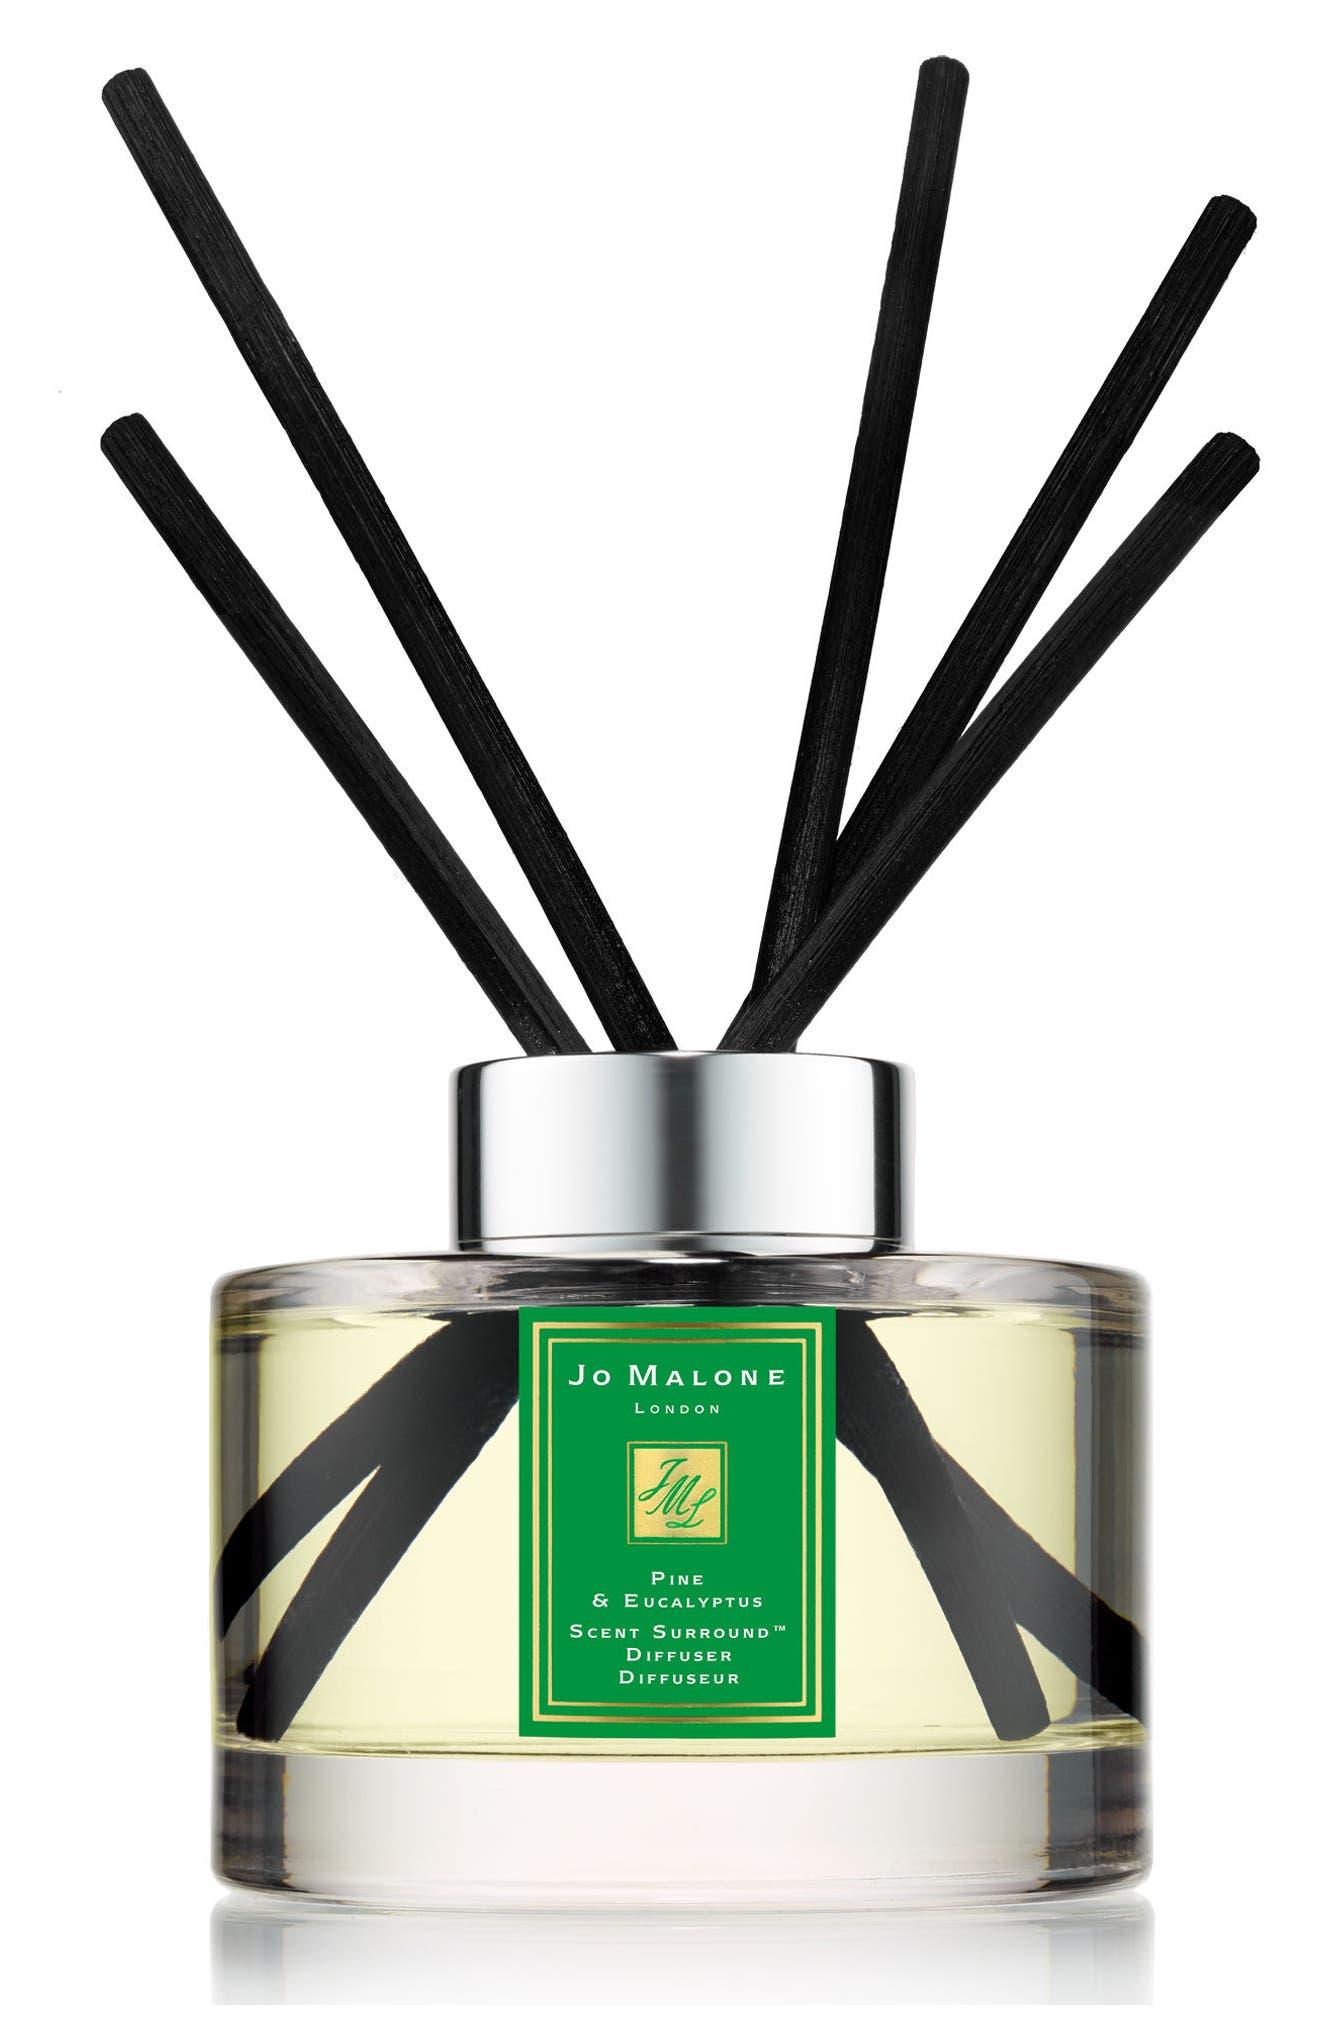 Jo Malone London™ Pine & Eucalyptus Room Diffuser